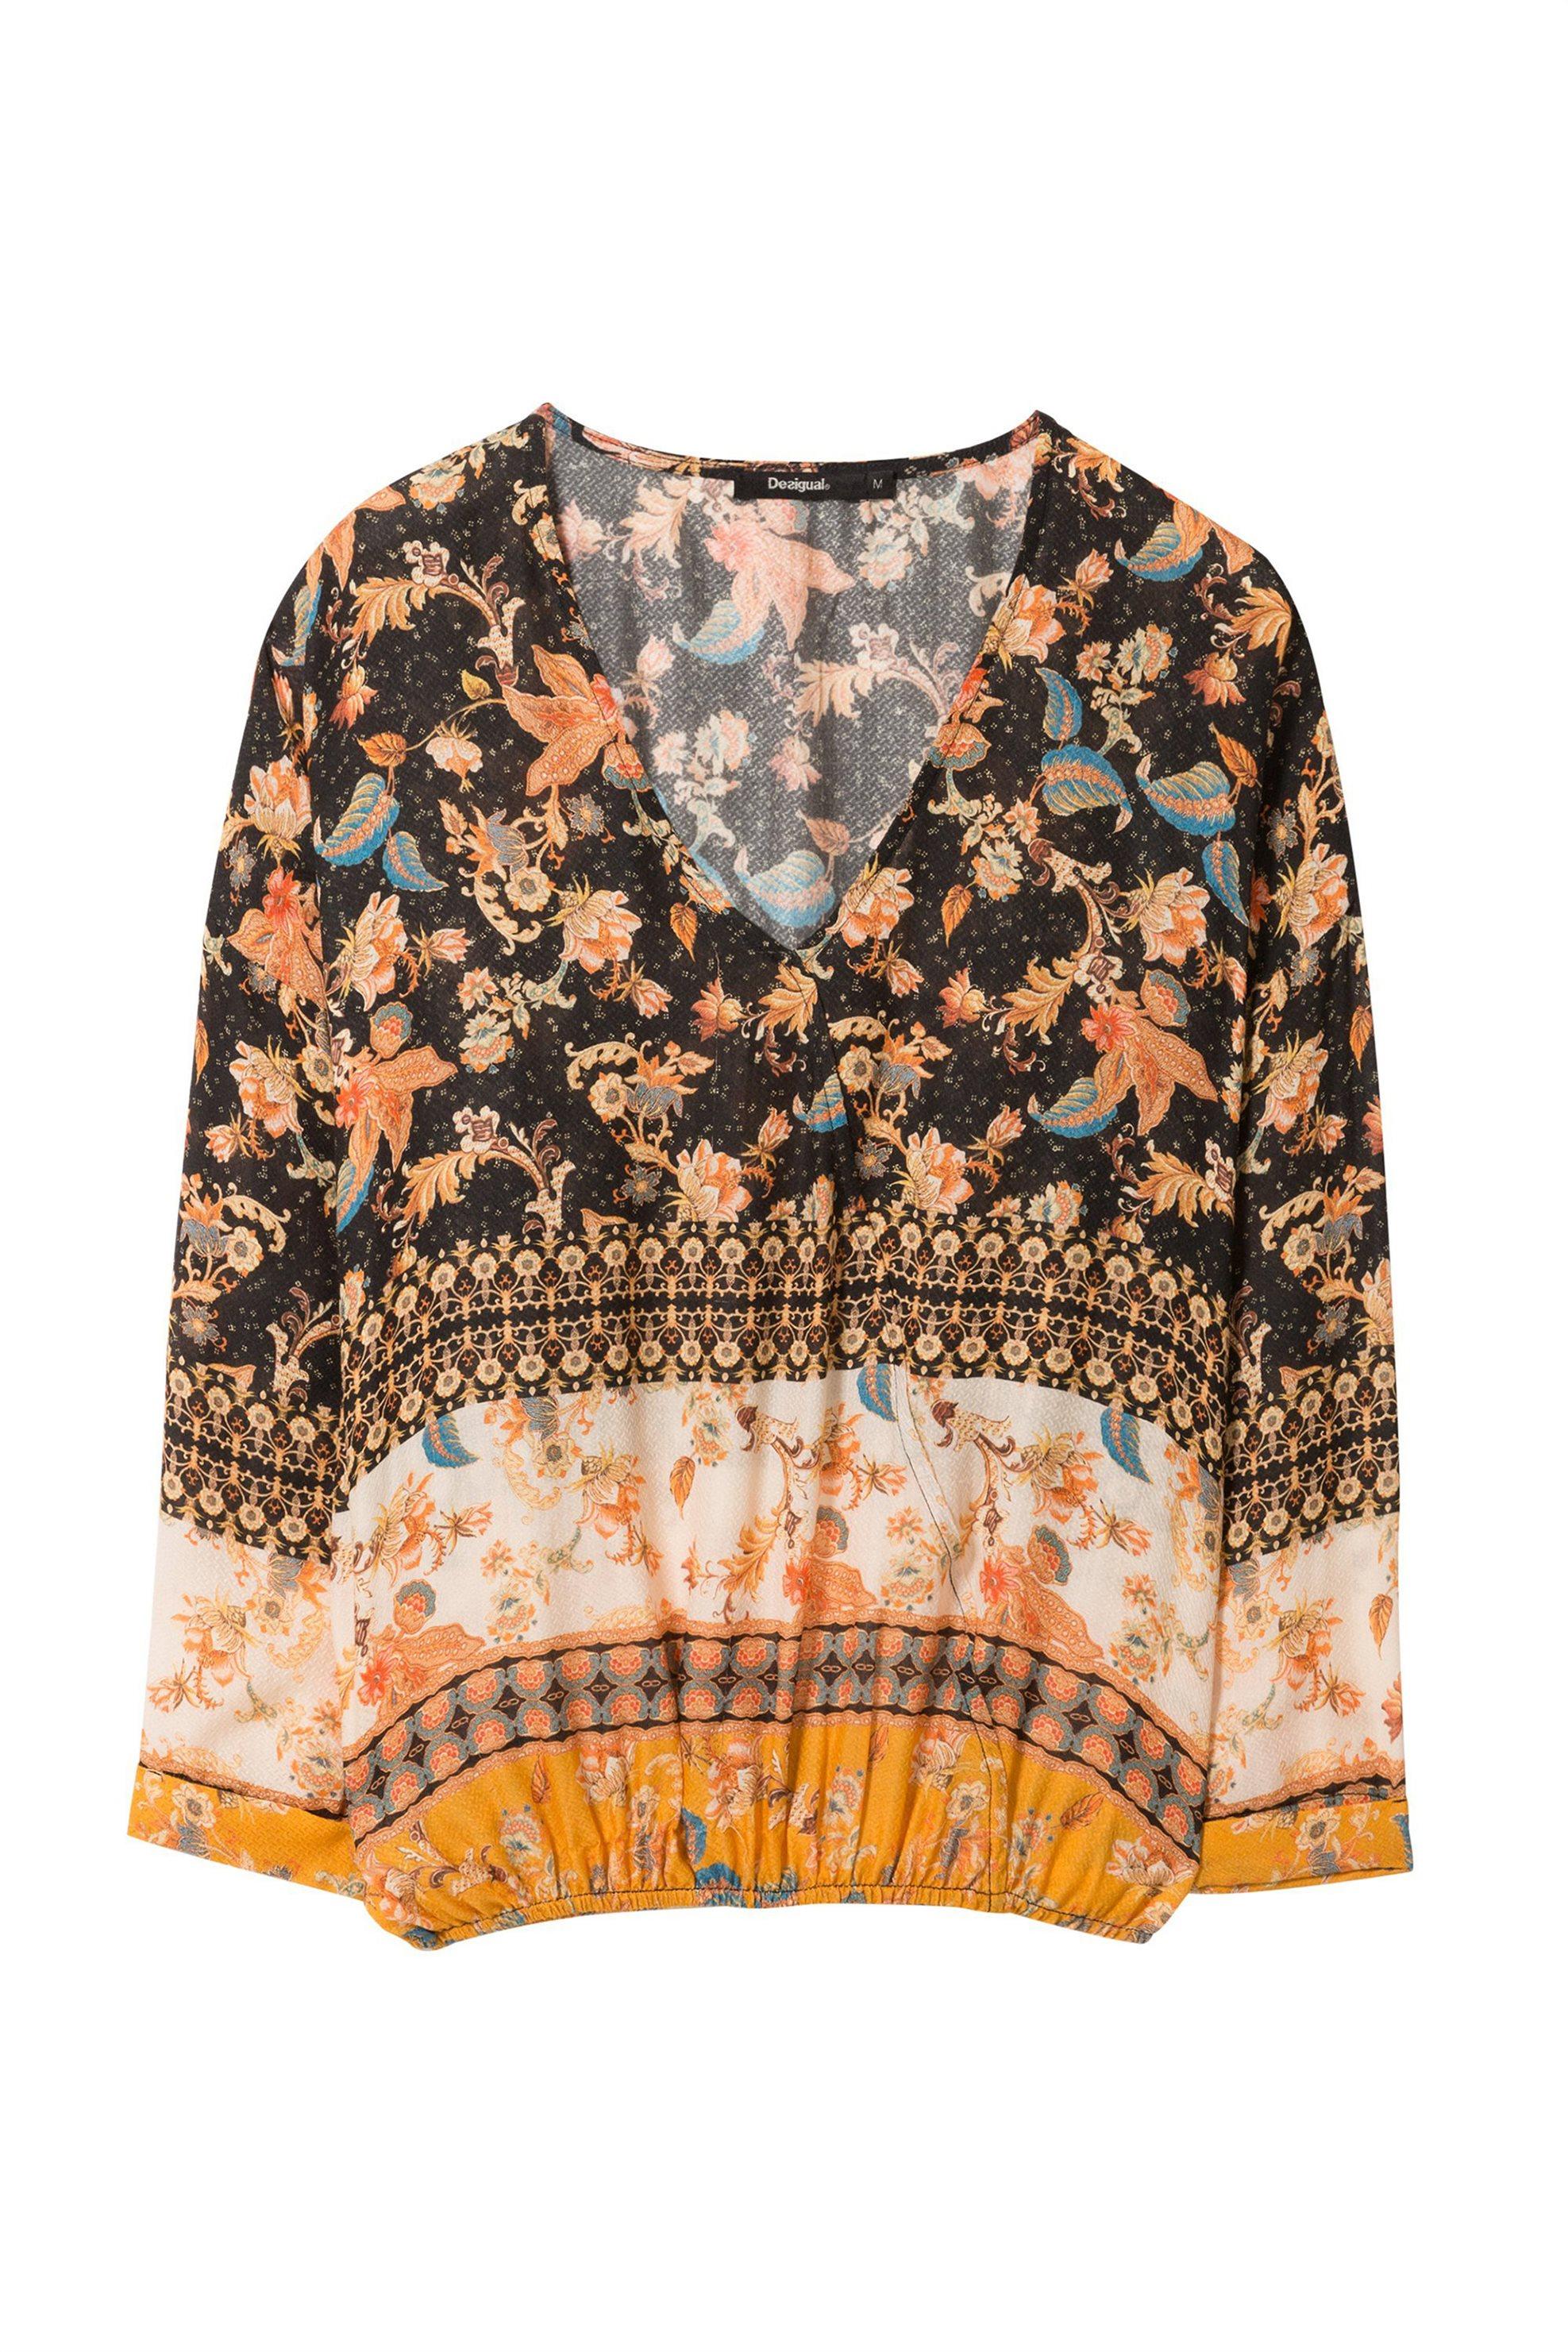 1f78cee83624 Γυναικείες Μπλούζες - Σελίδα 1514